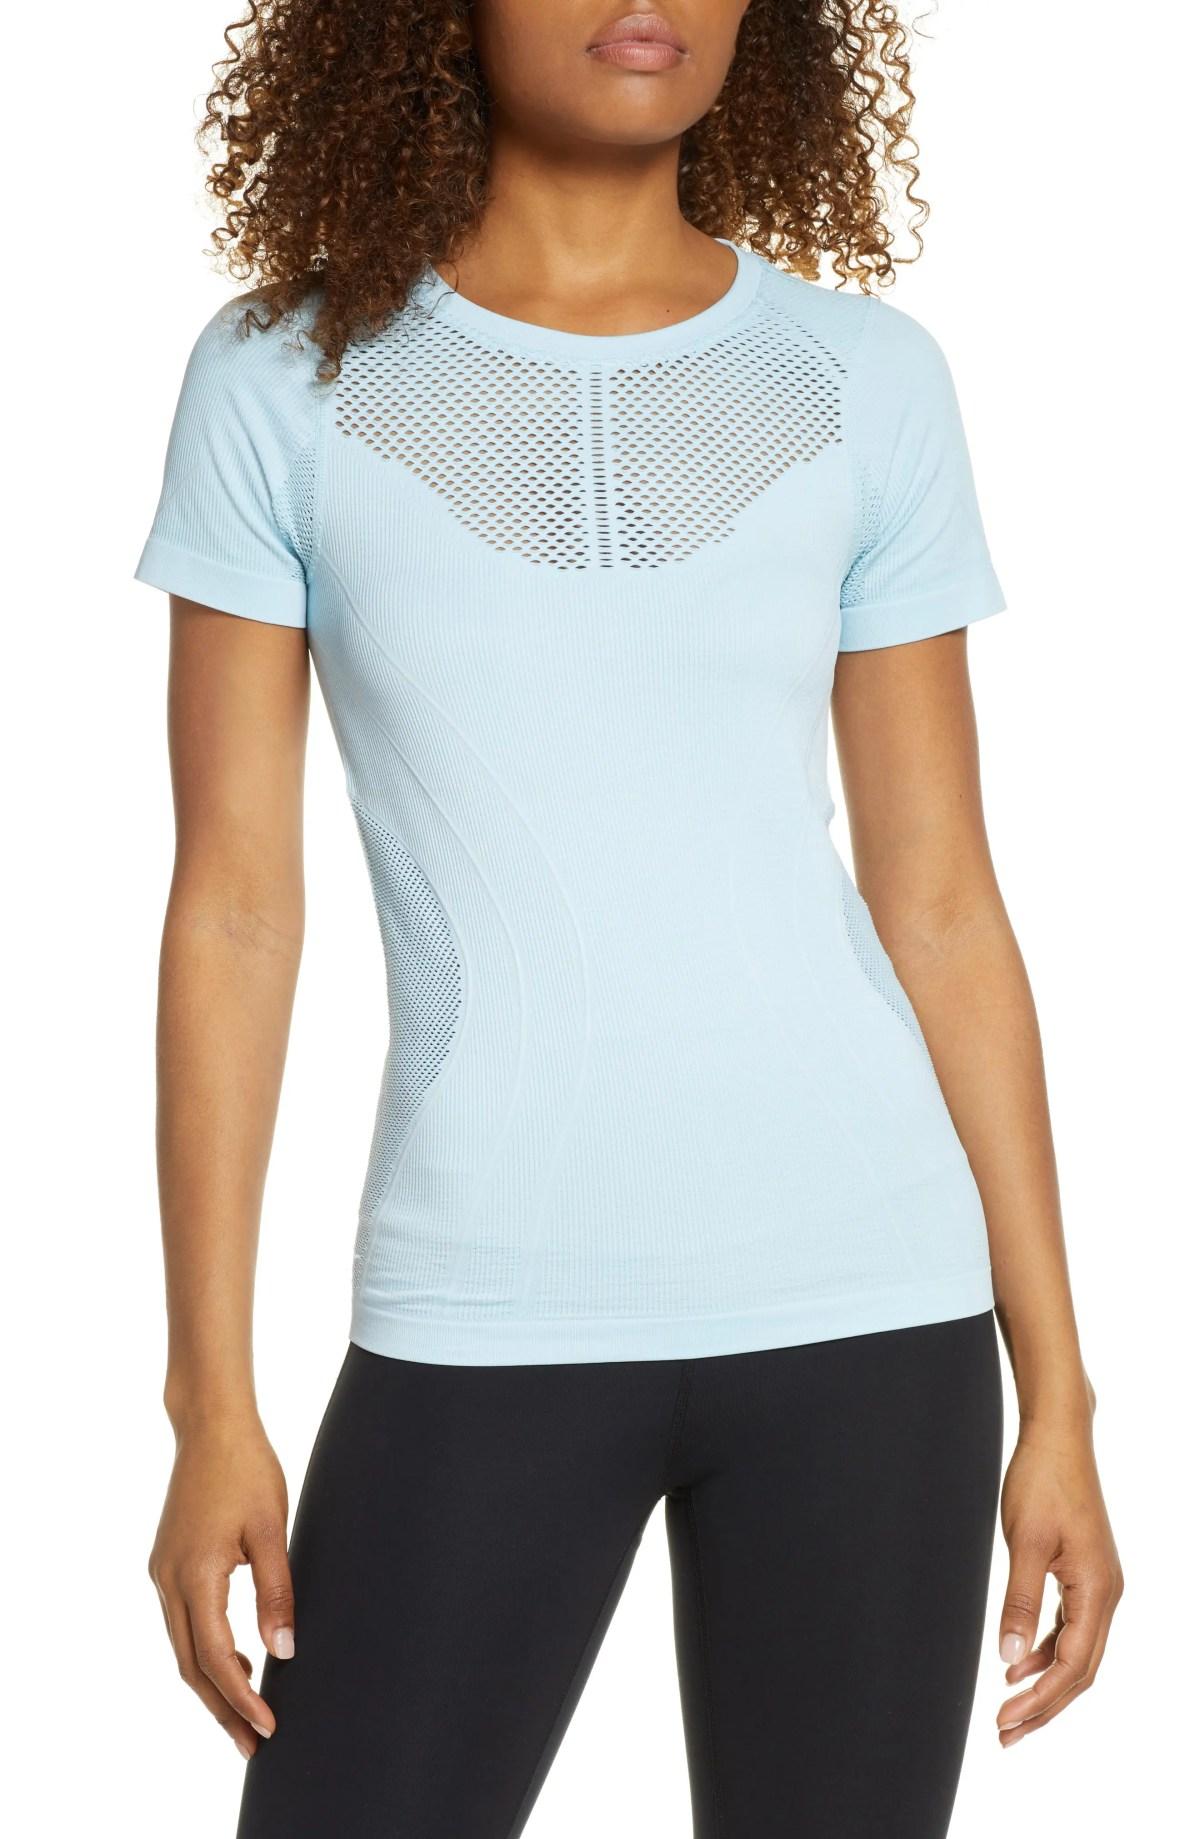 ZELLA Seamless Shirt, Main, color, BLUE ORYDALIS